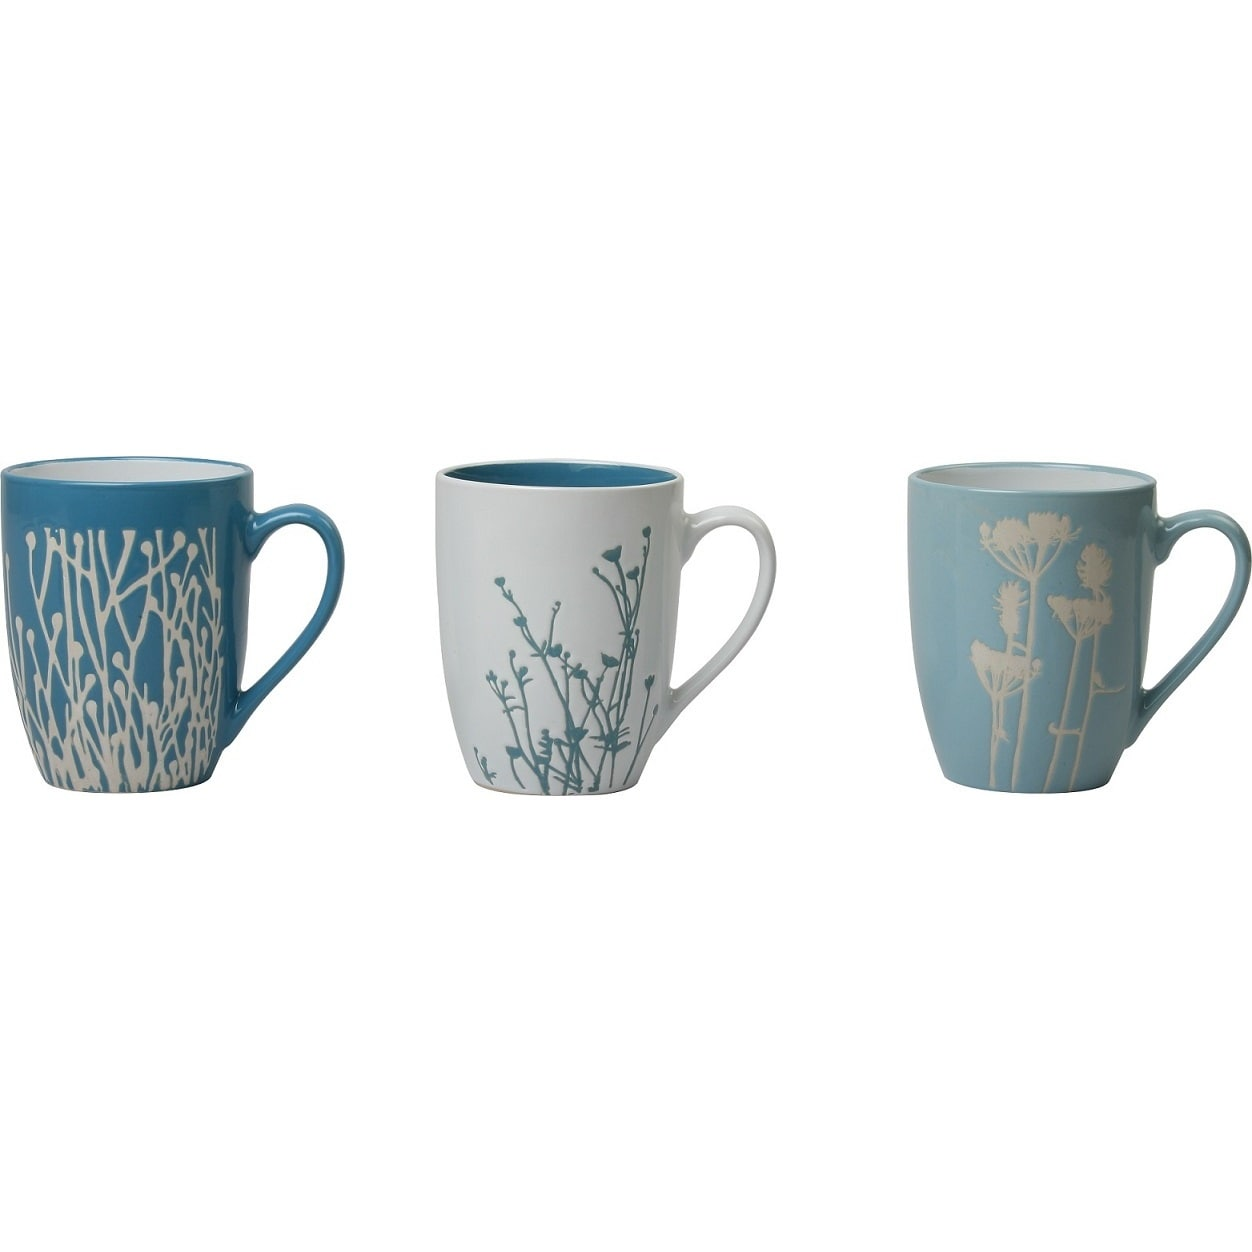 Wee's Beyond Tree 12oz Coffee Mug - Set of 6 (12oz Coffee...